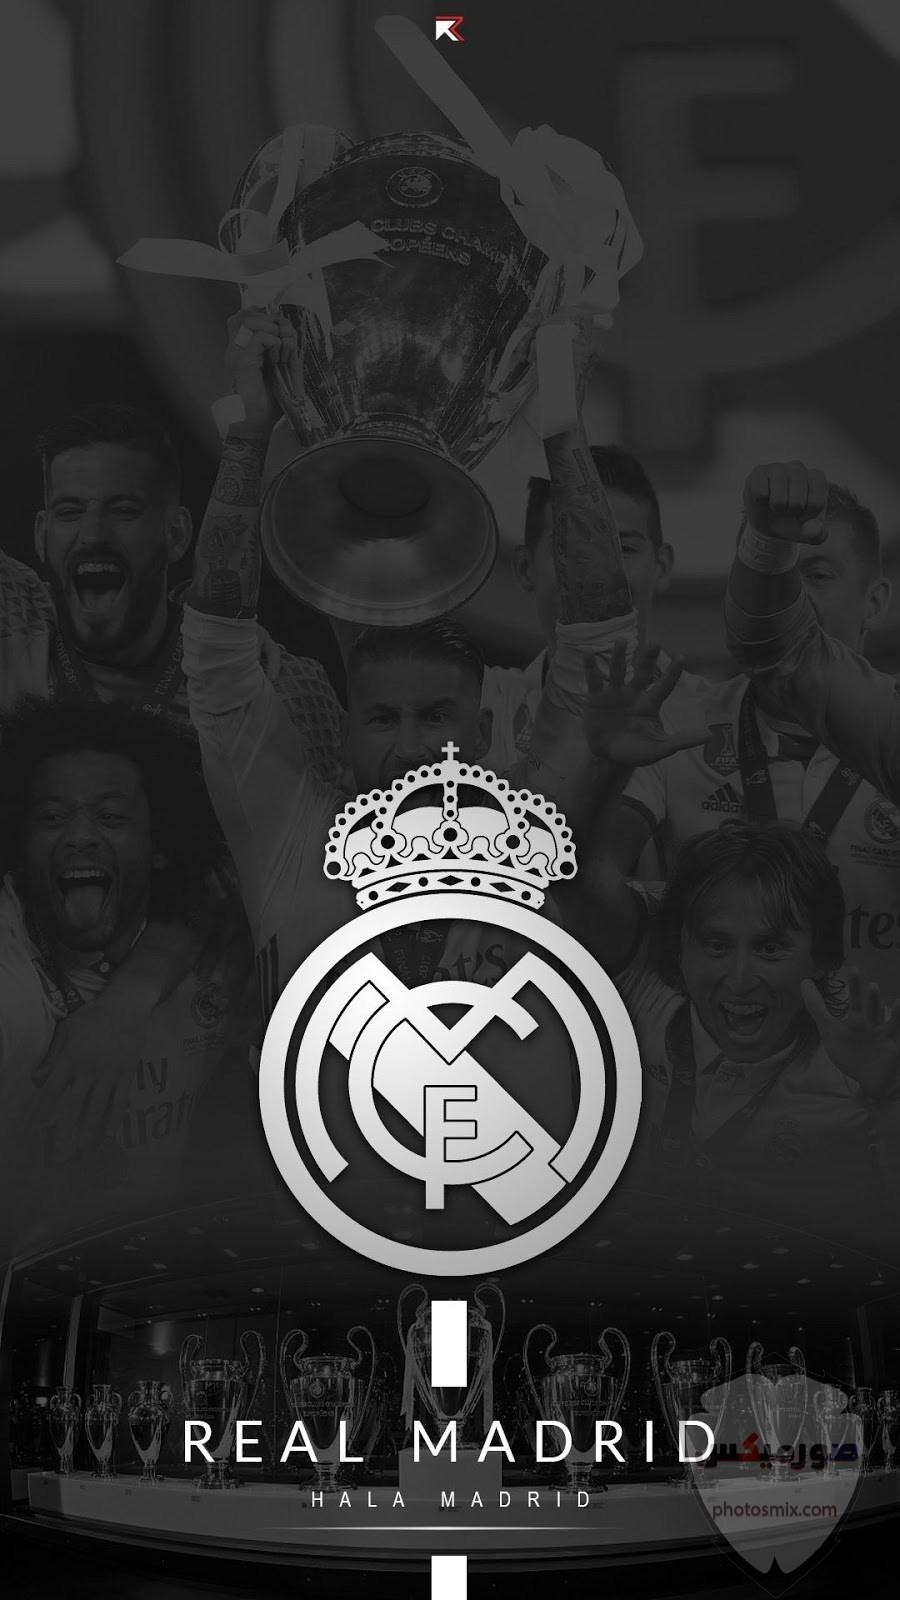 صور ريال مدريد 2020خلفيات ورمزيات ريال مدريد صور لاعبي ريال مدريد real madrid 11